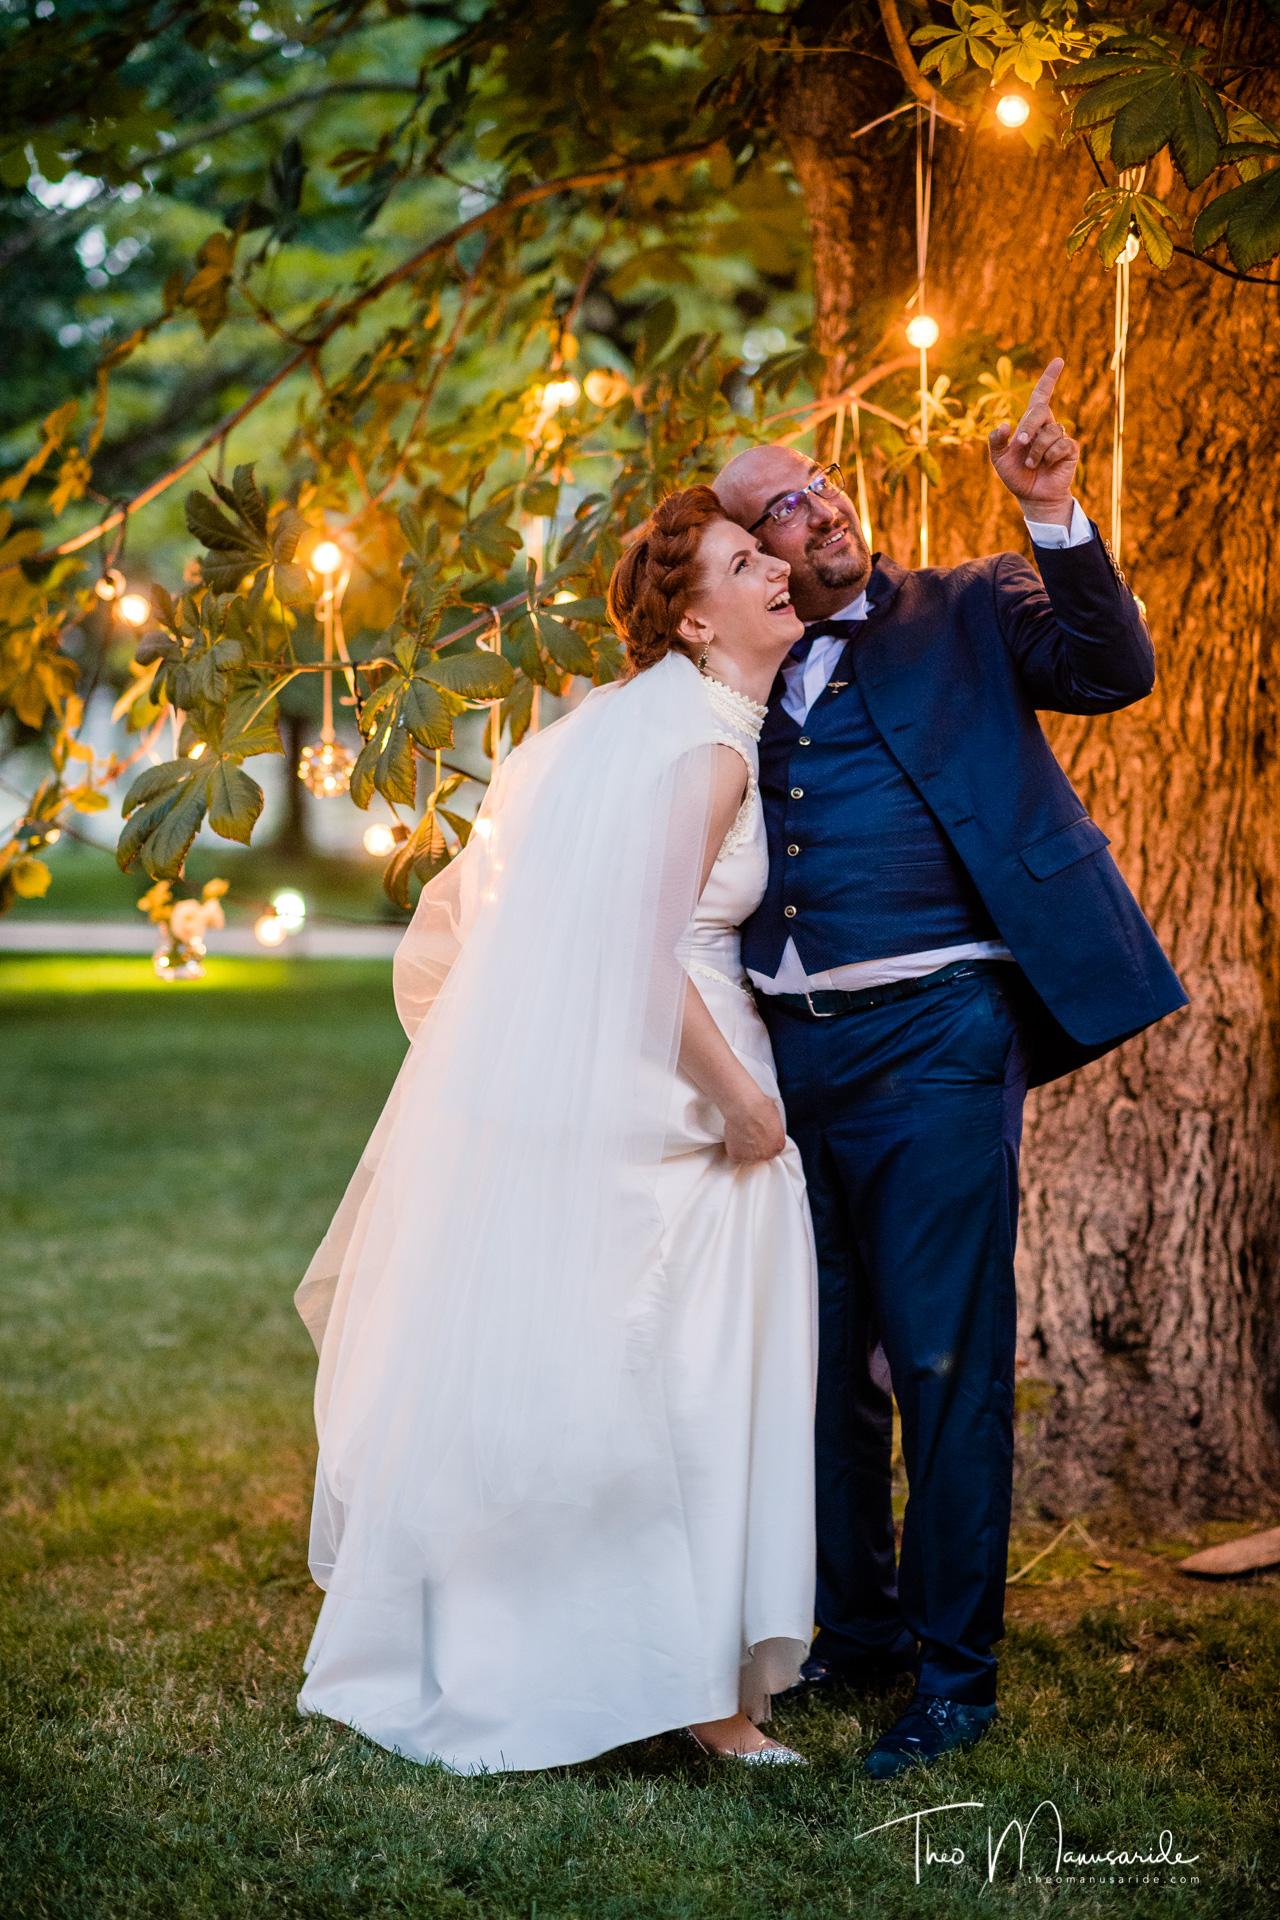 fotograf-nunta-domeniul-manasia-37